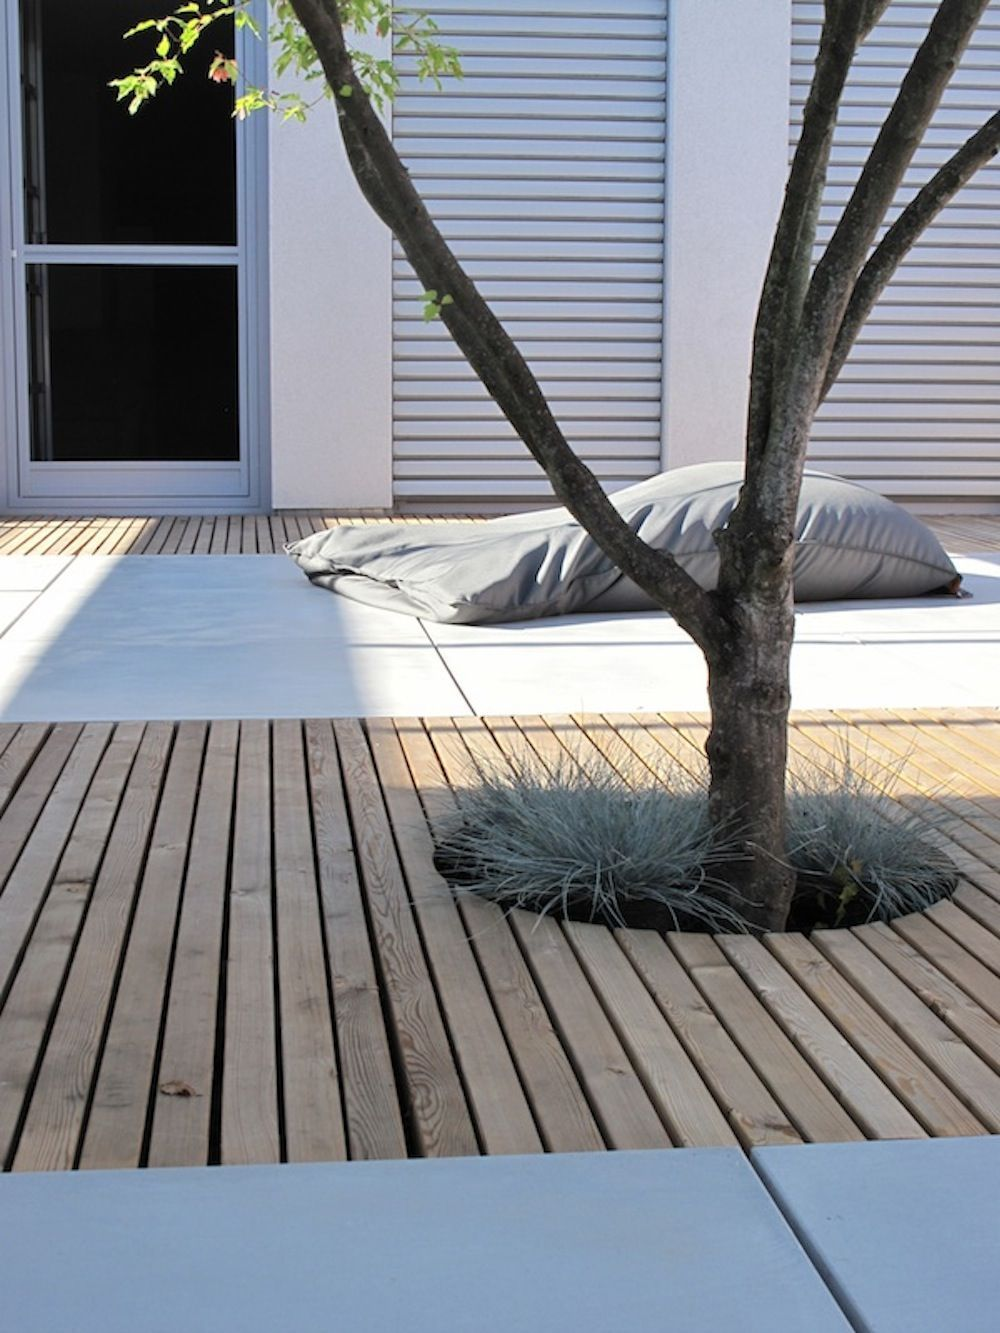 Bilder | tomhimmelgrün gartenarchitektur - Gartengestaltung Ideen #japangarden